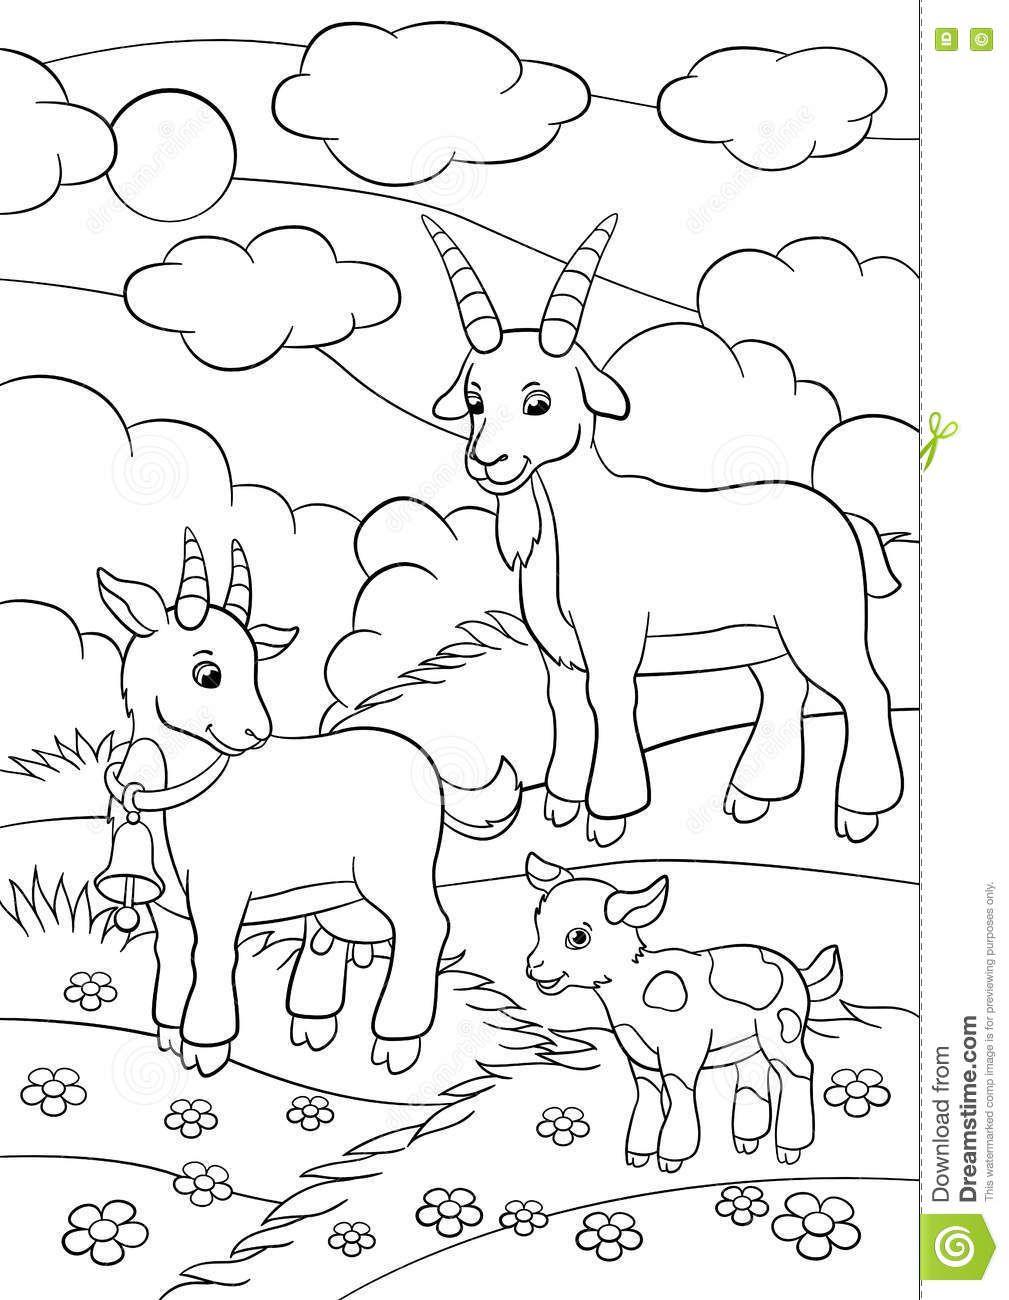 Coloring Pages Farm Animals Goat Family Stock Vector Illustration Of Contour Educat Farm Animal Coloring Pages Farm Coloring Pages Zoo Animal Coloring Pages